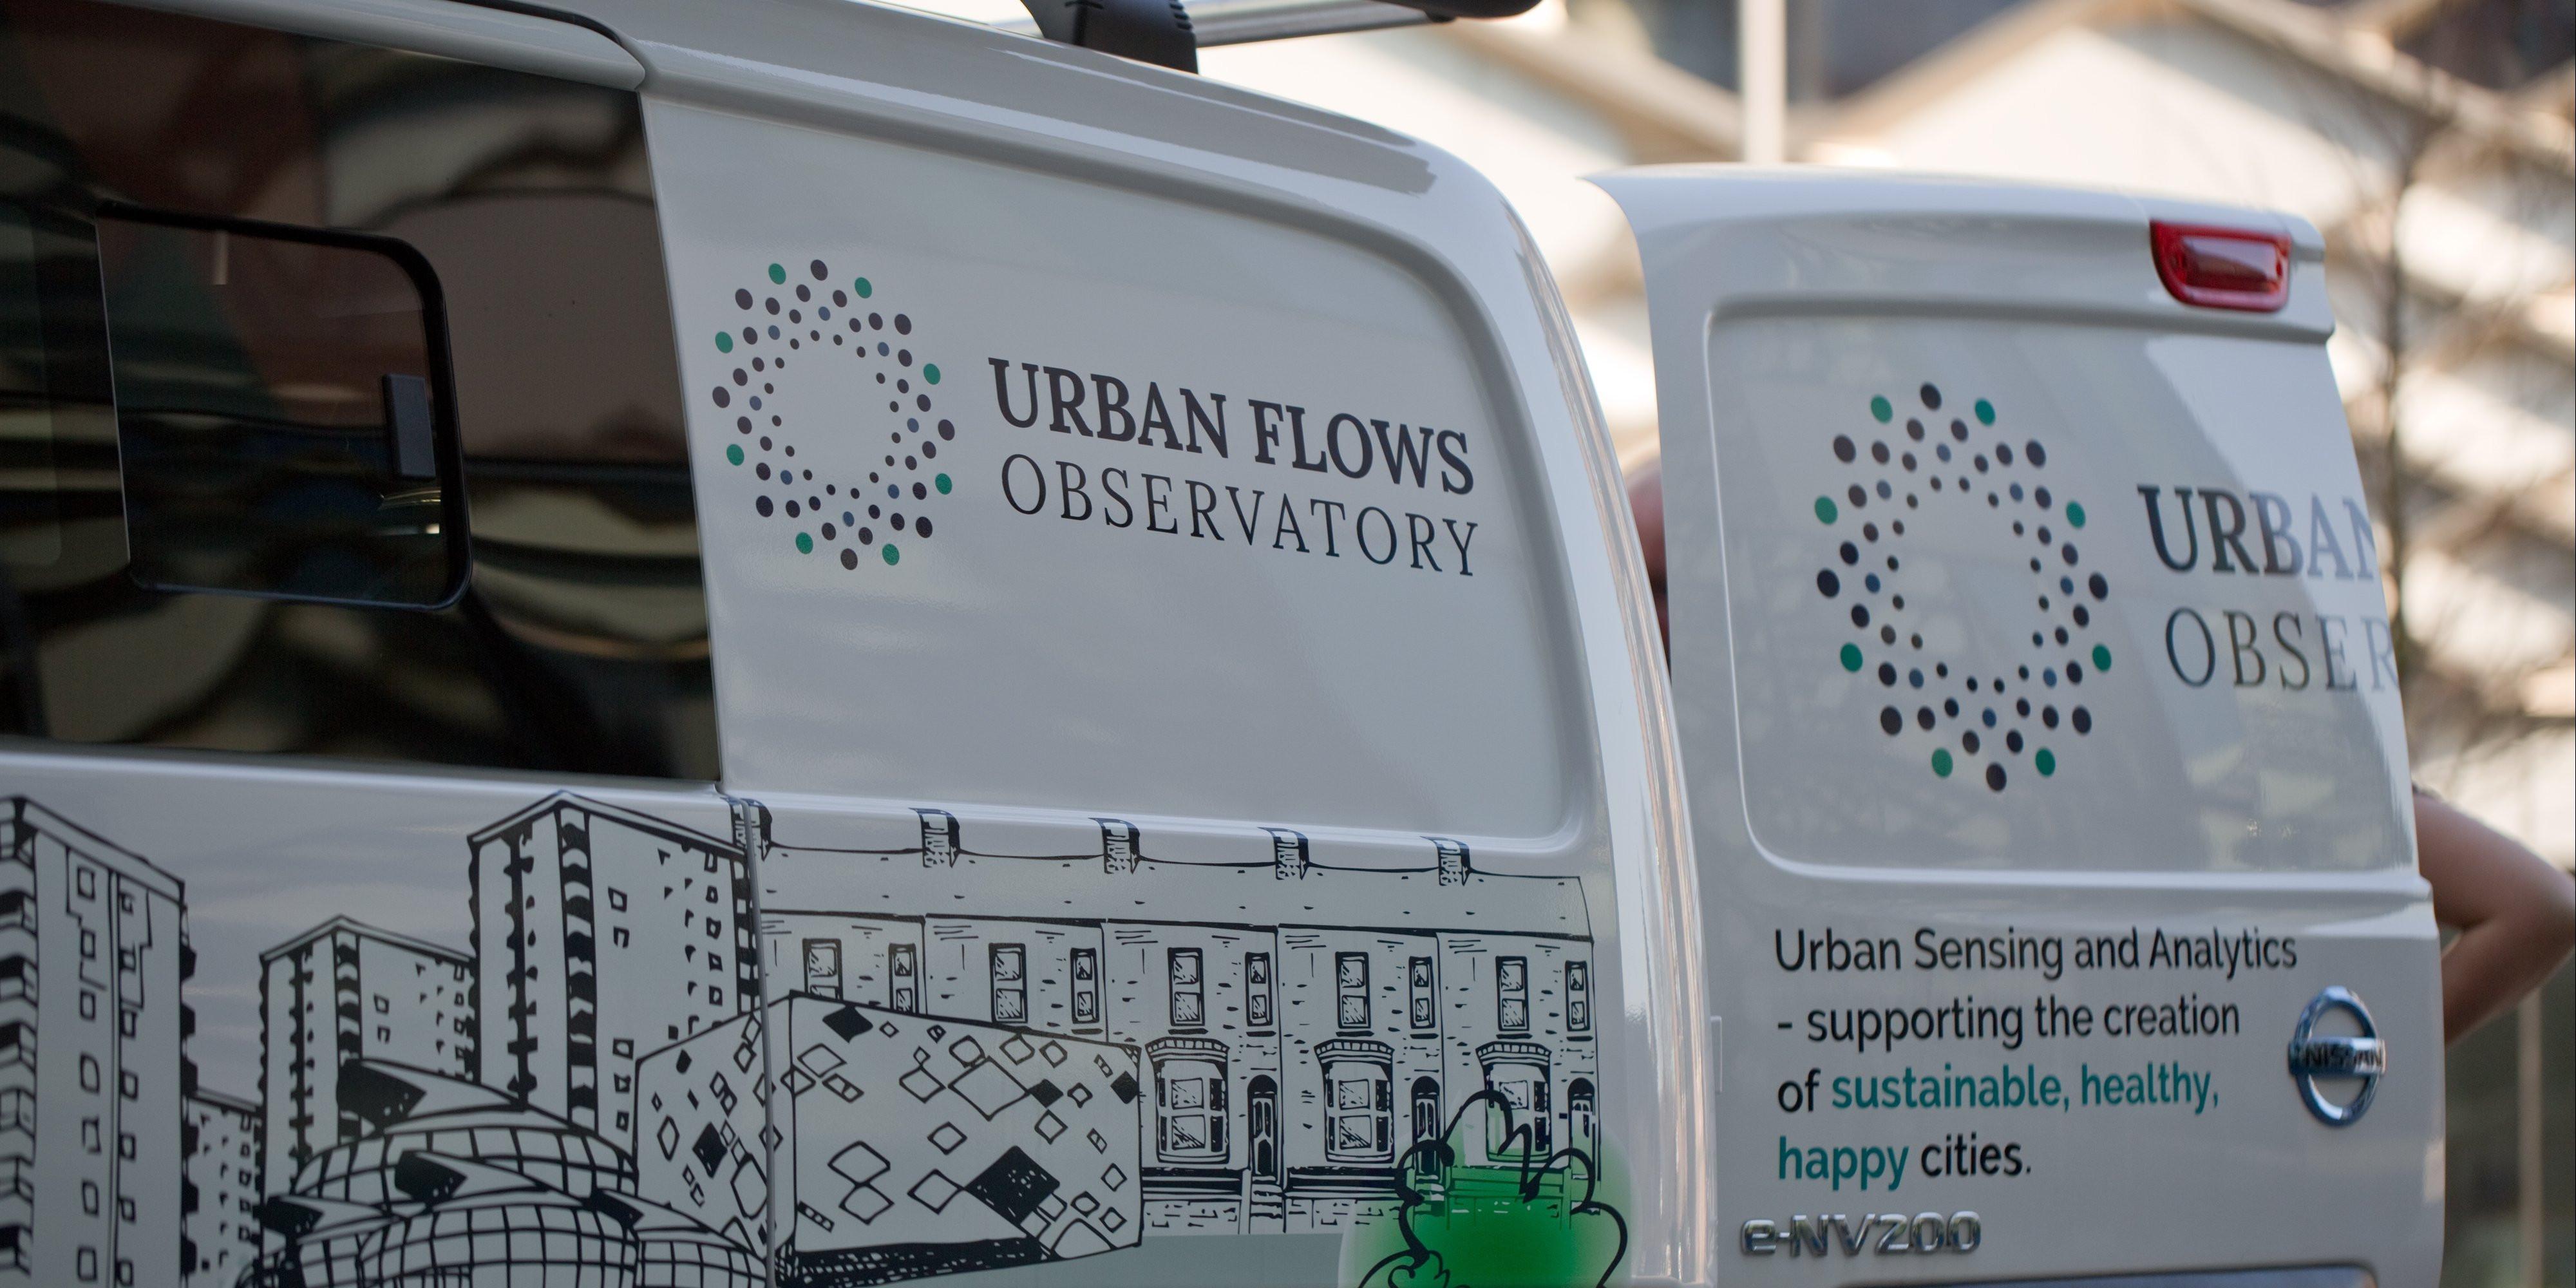 Urbans Flows Observatory Hackathon